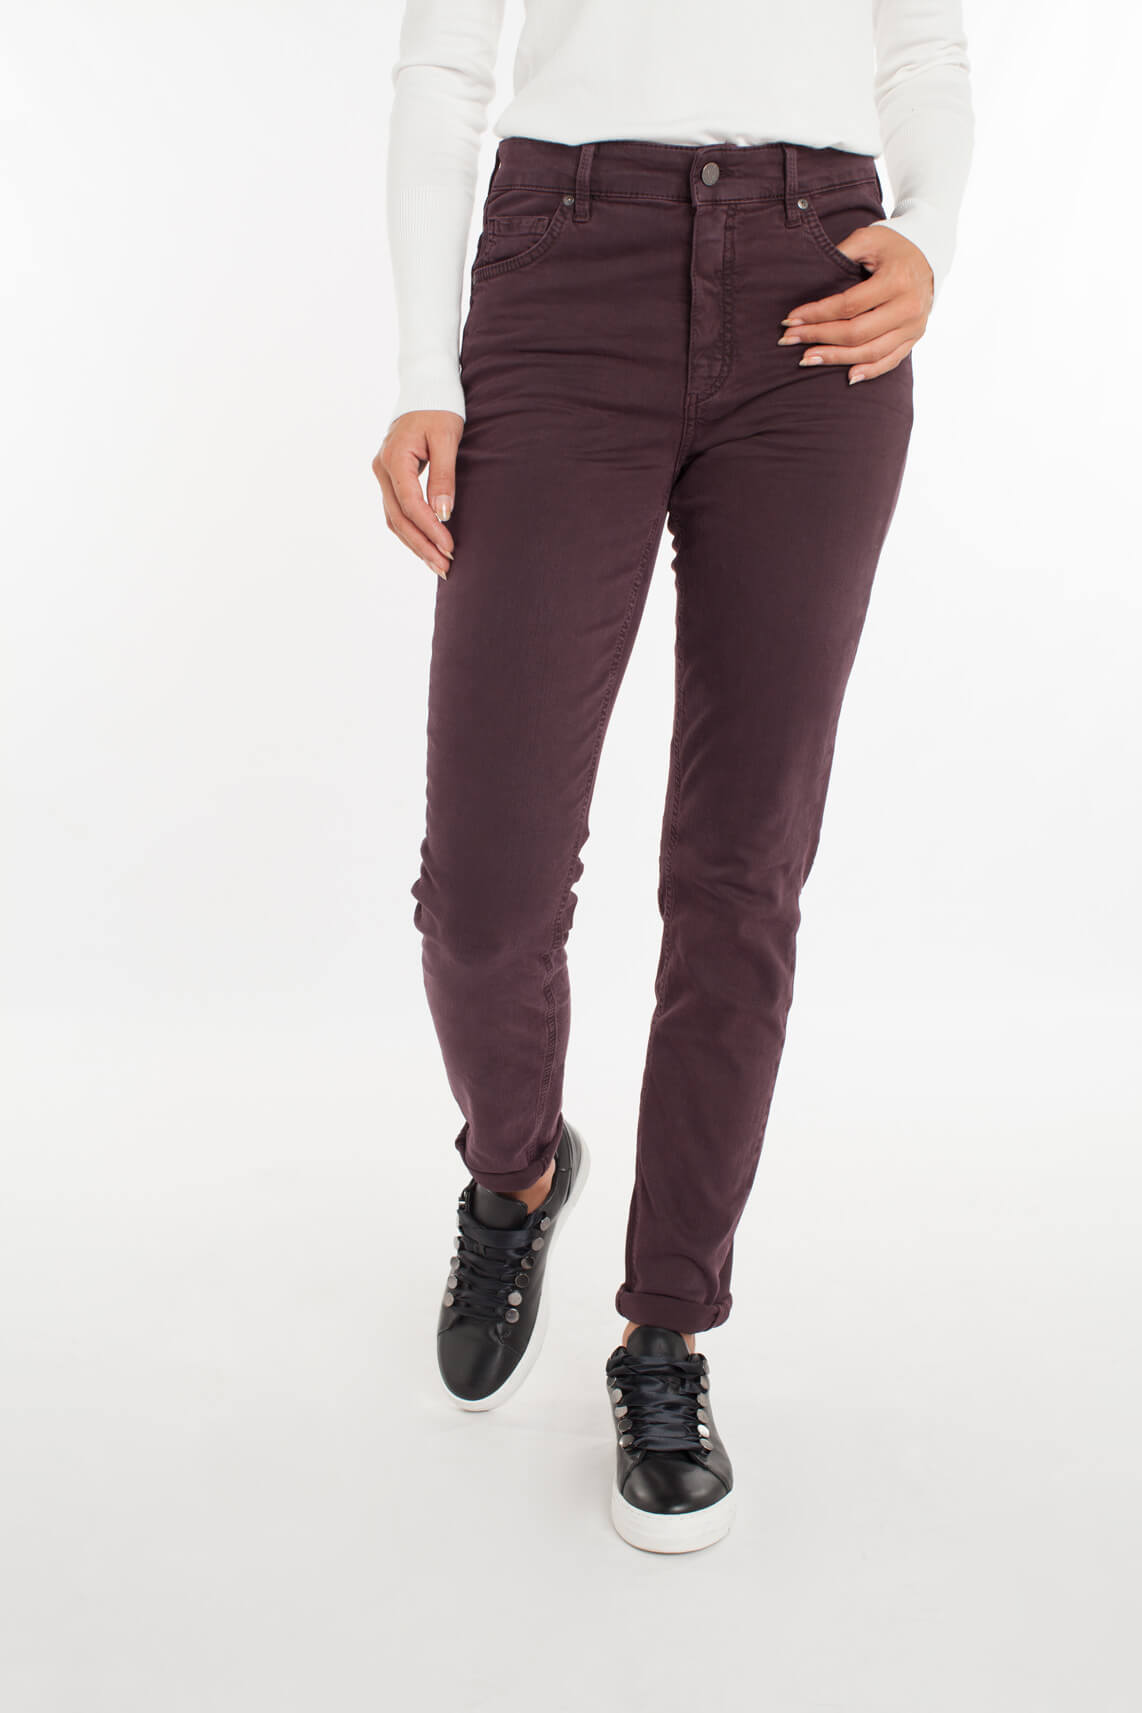 Rosner Dames Audrey jeans Paars